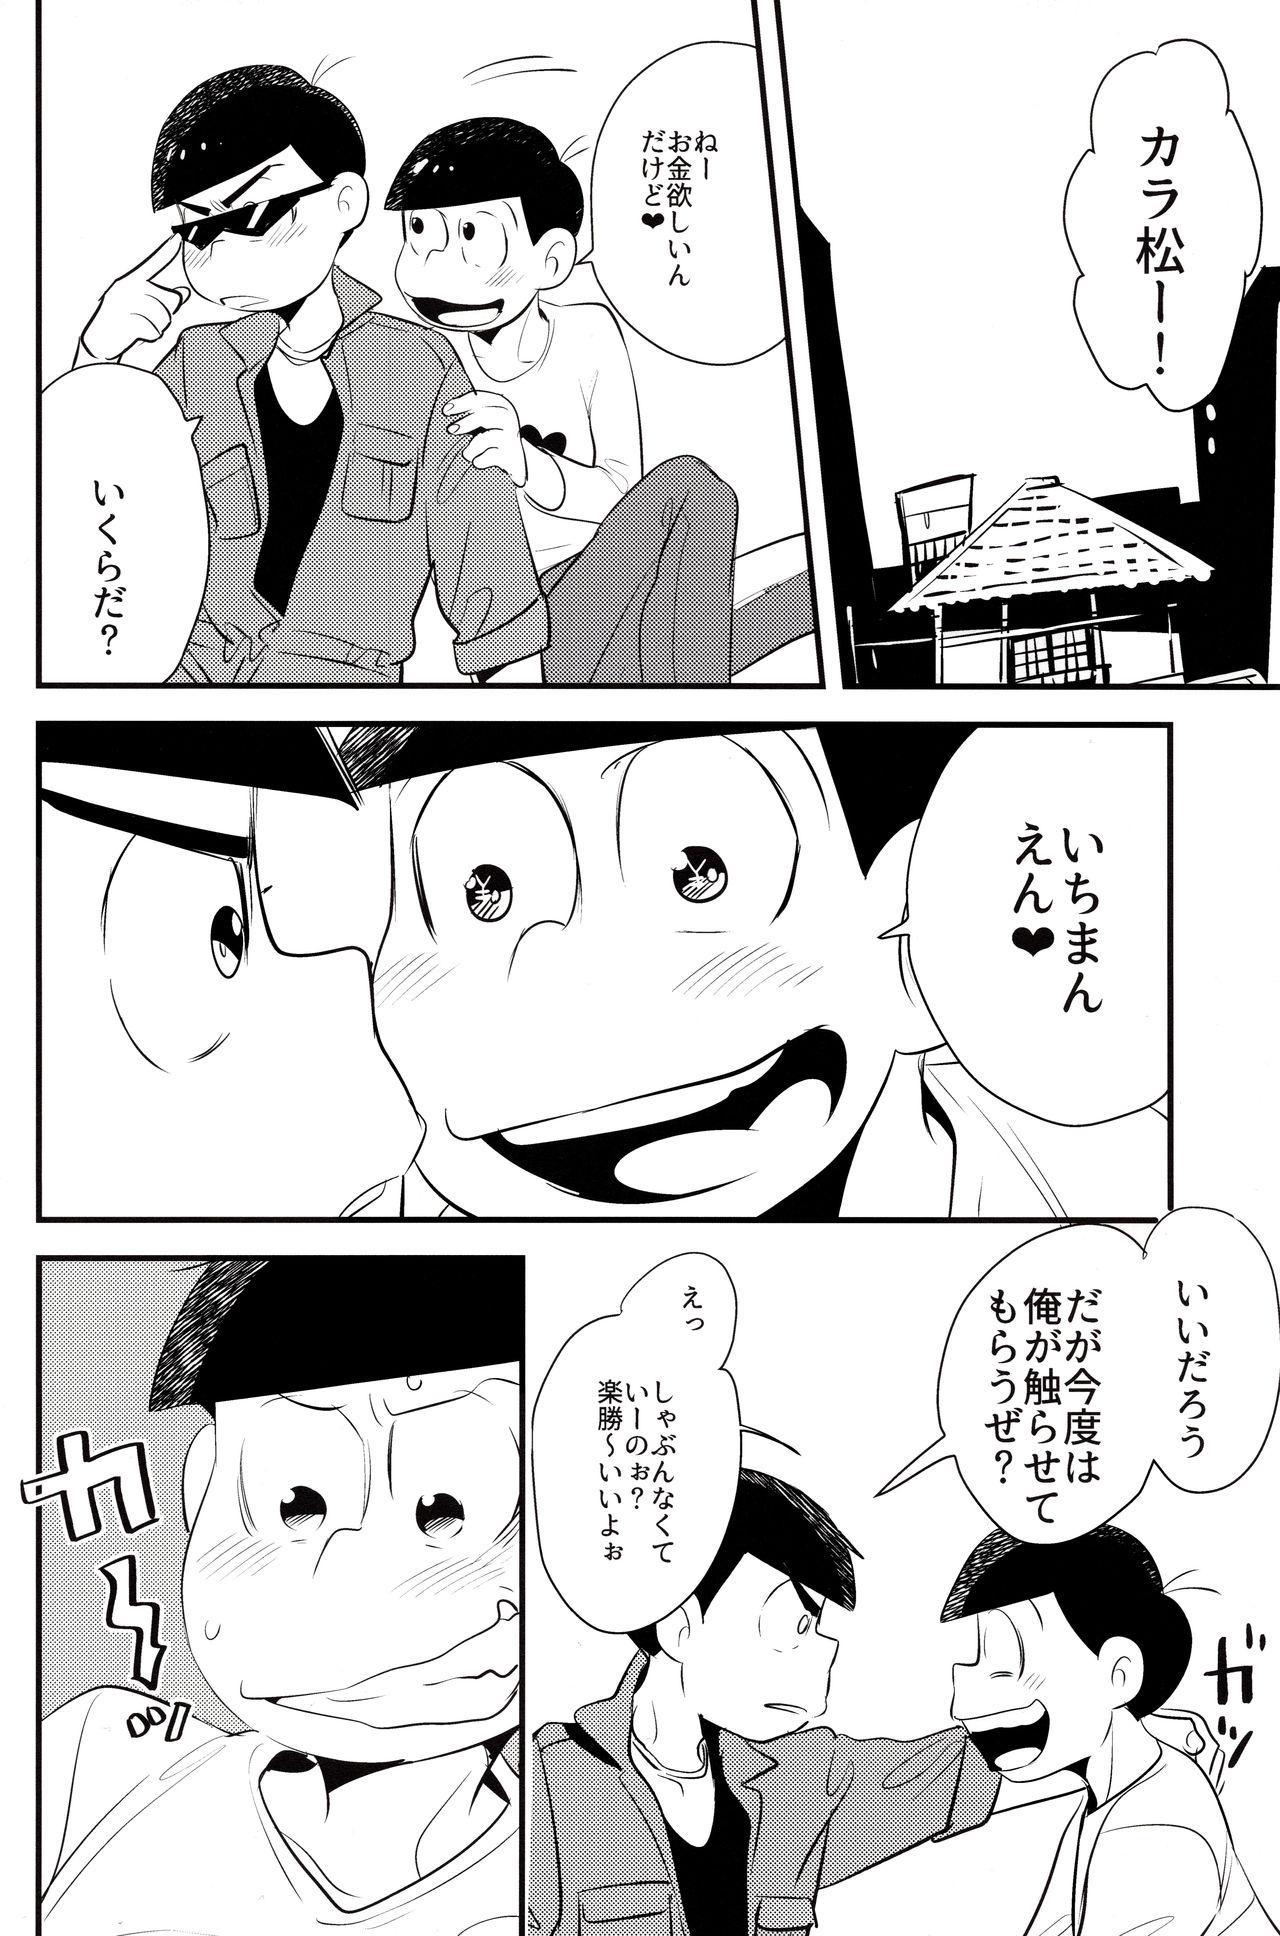 Onii-chan wa Uritai!! 9